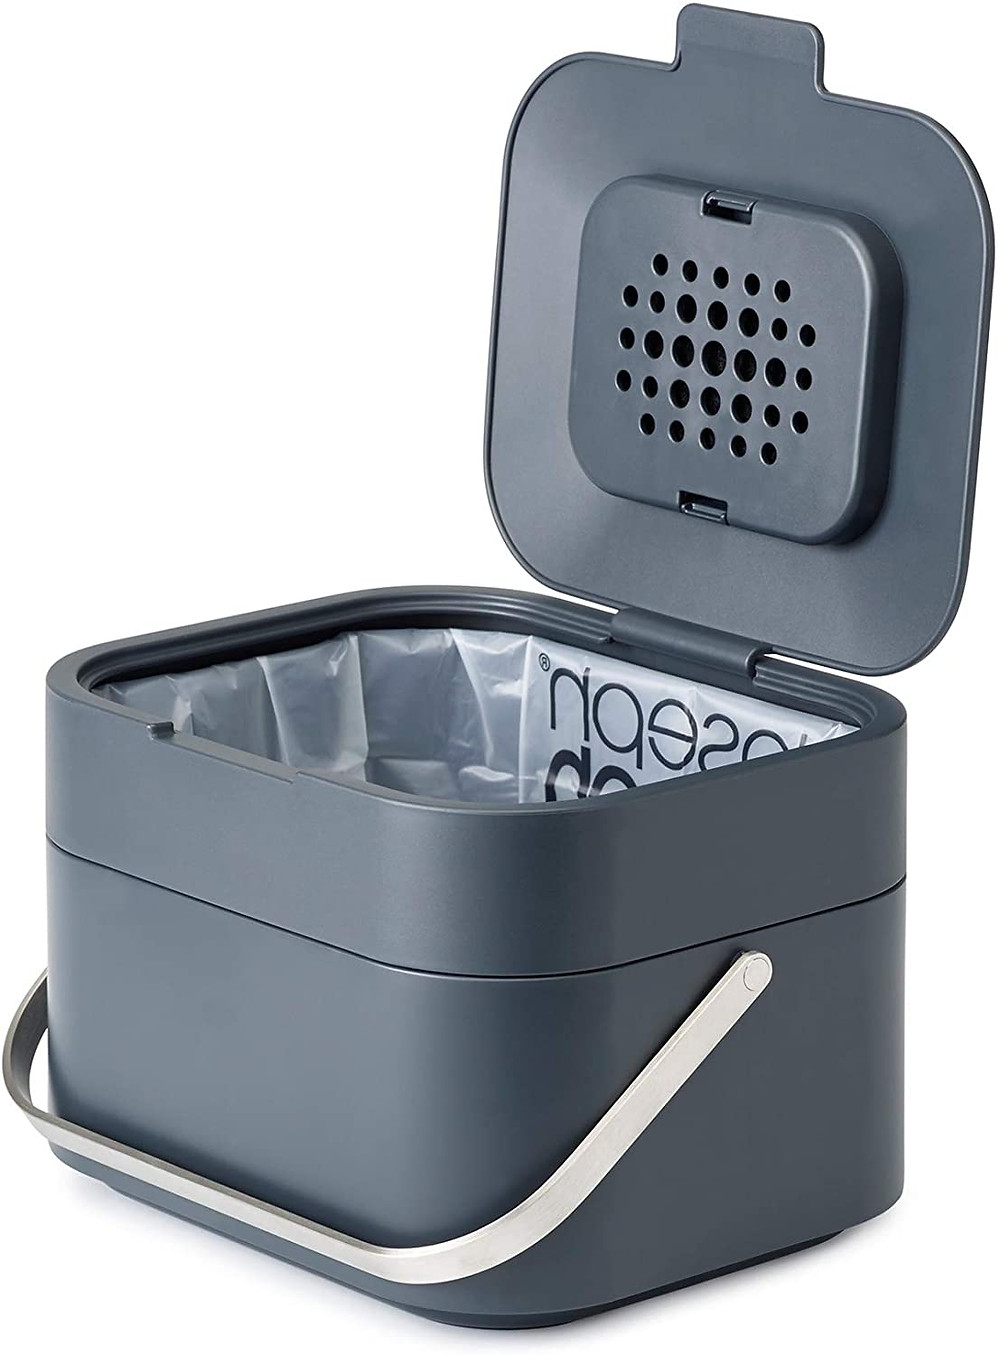 Joseph Joseph food waste caddy with odour filter